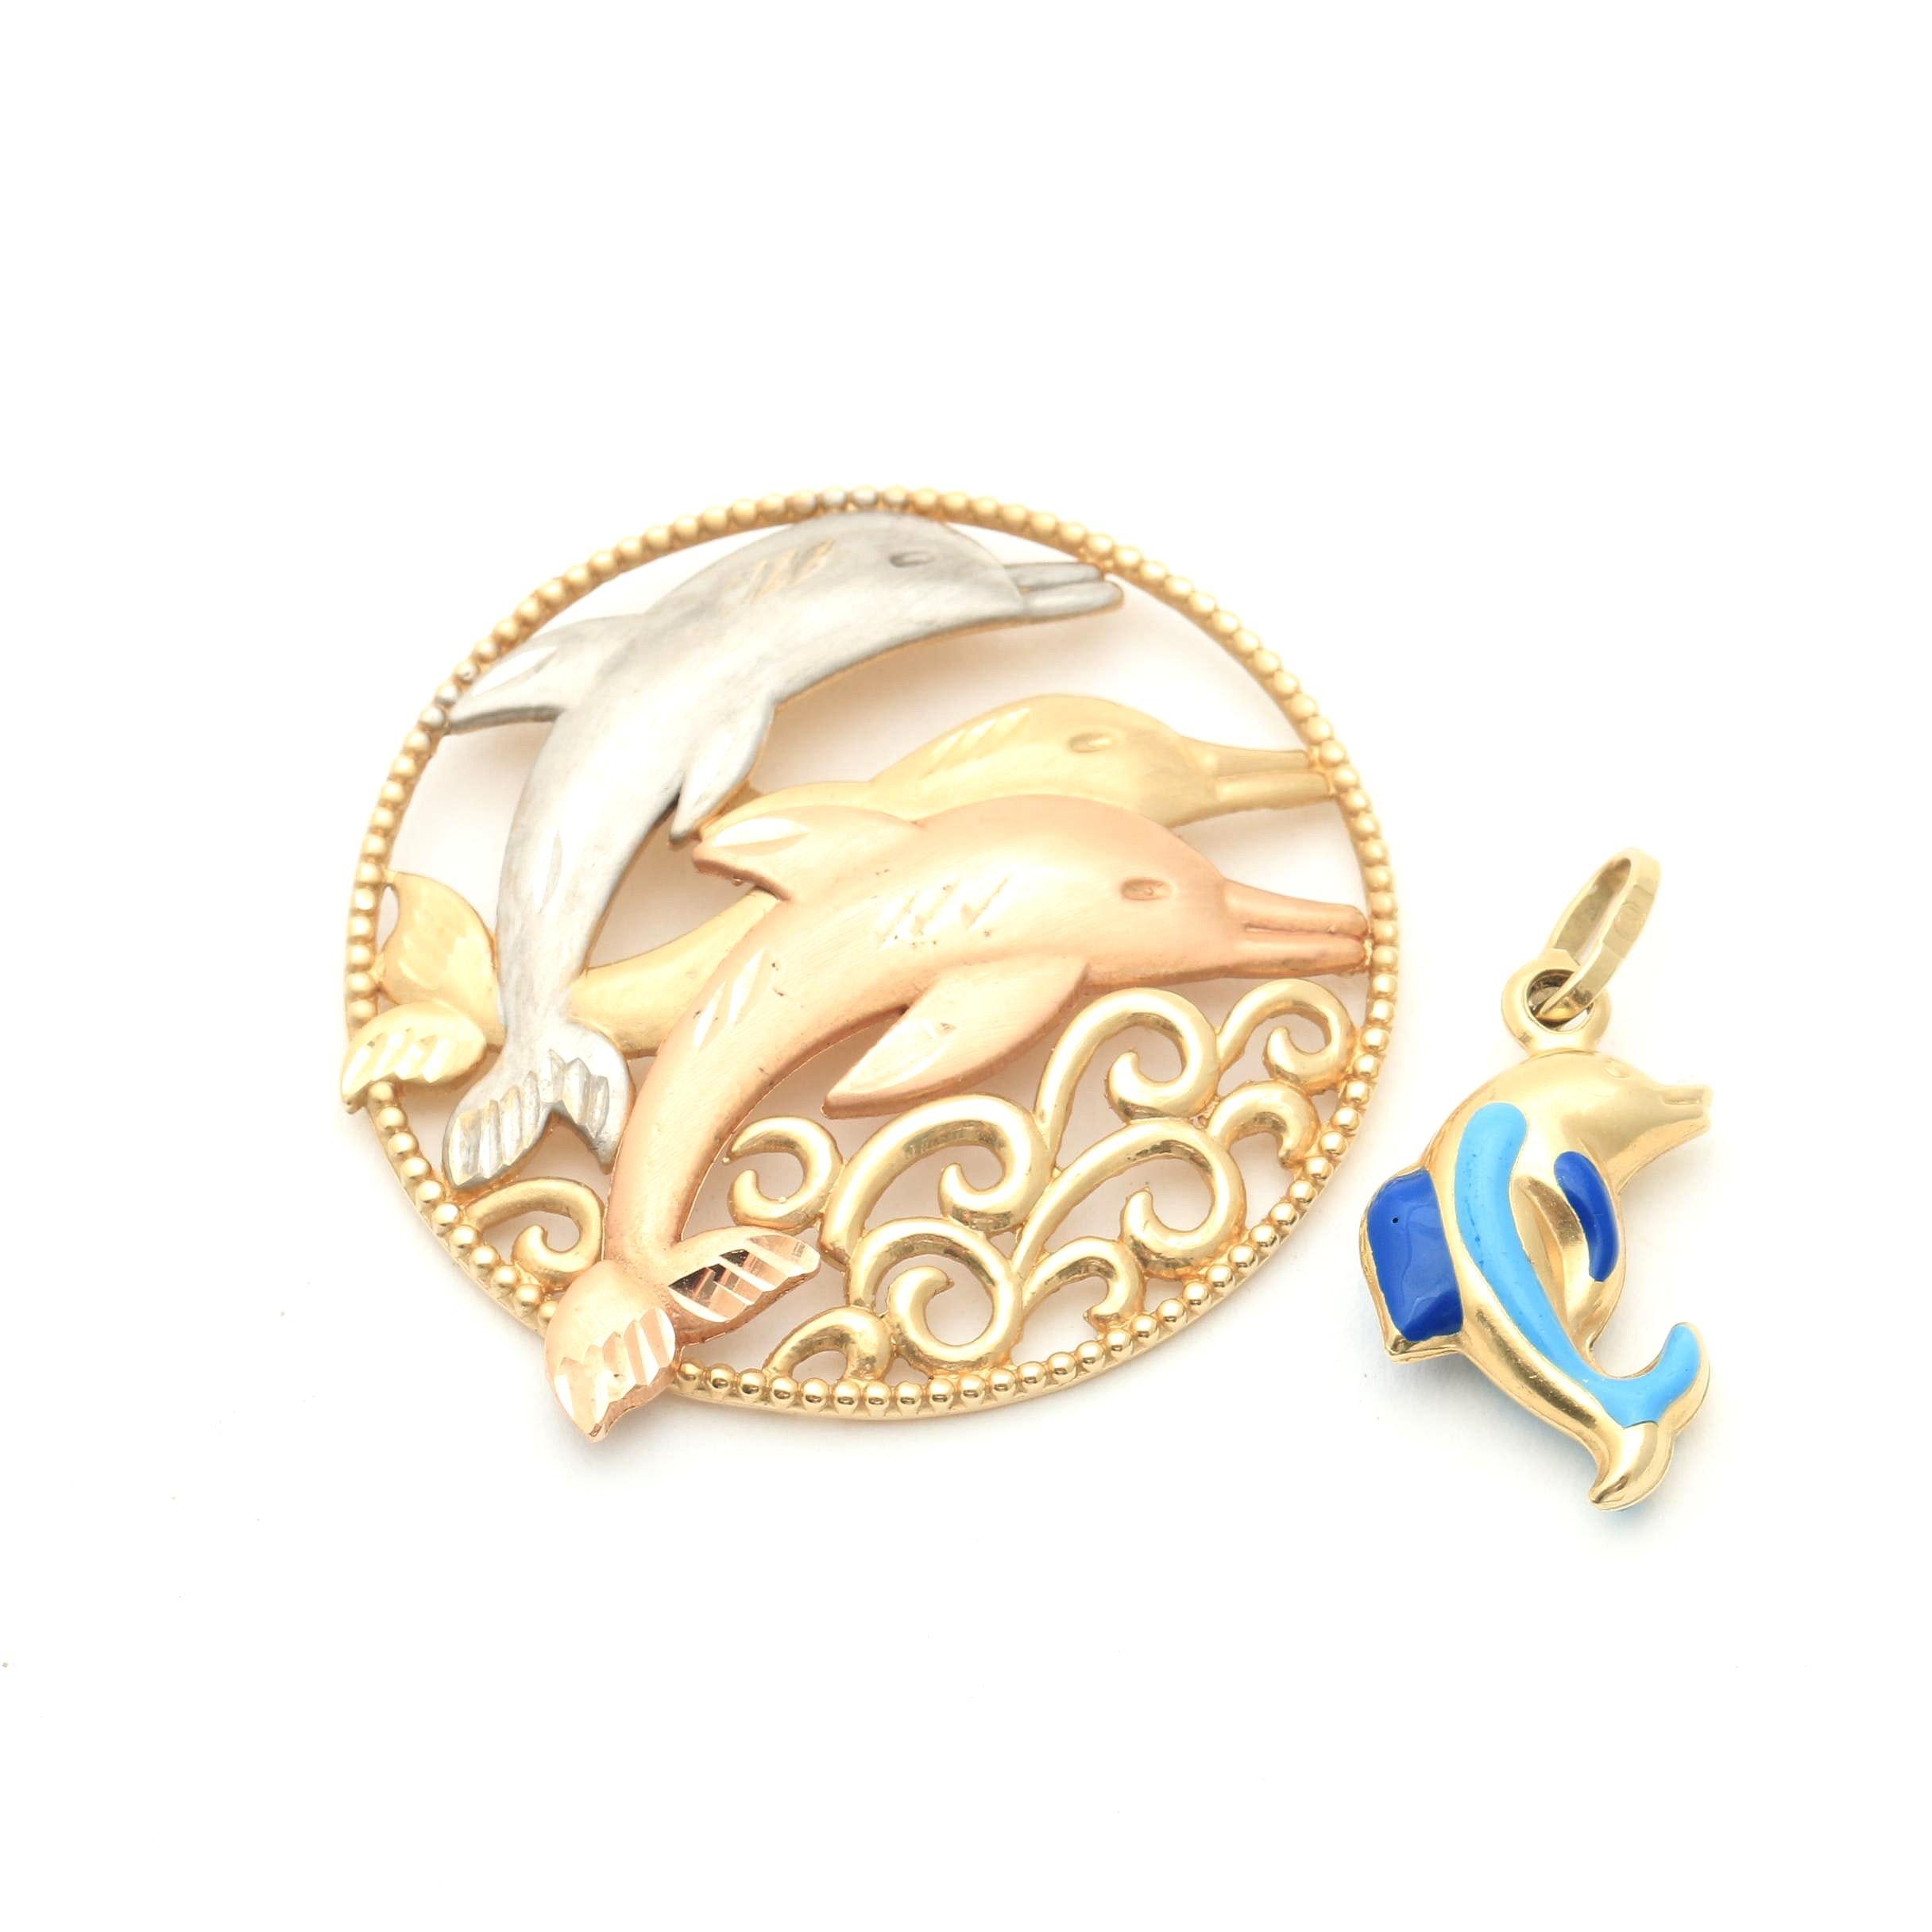 14K Yellow Gold Dolphin Pendants